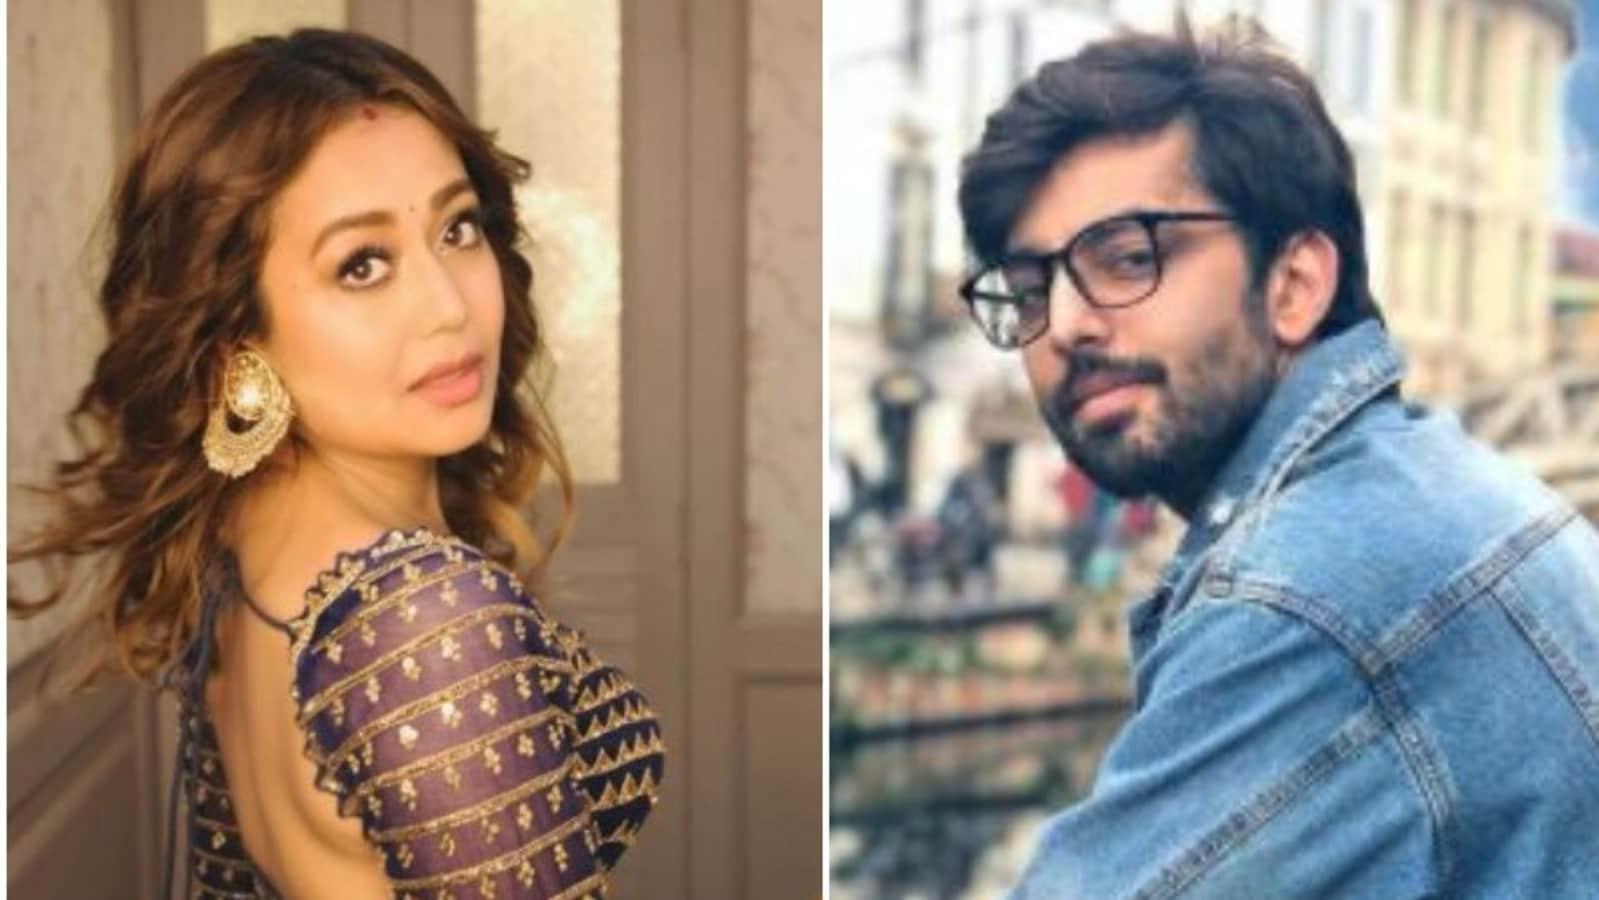 Neha Kakkar's ex Himansh Kohli talks about their breakup: 'She's moved on and I'm living my dream life' - Hindustan Times